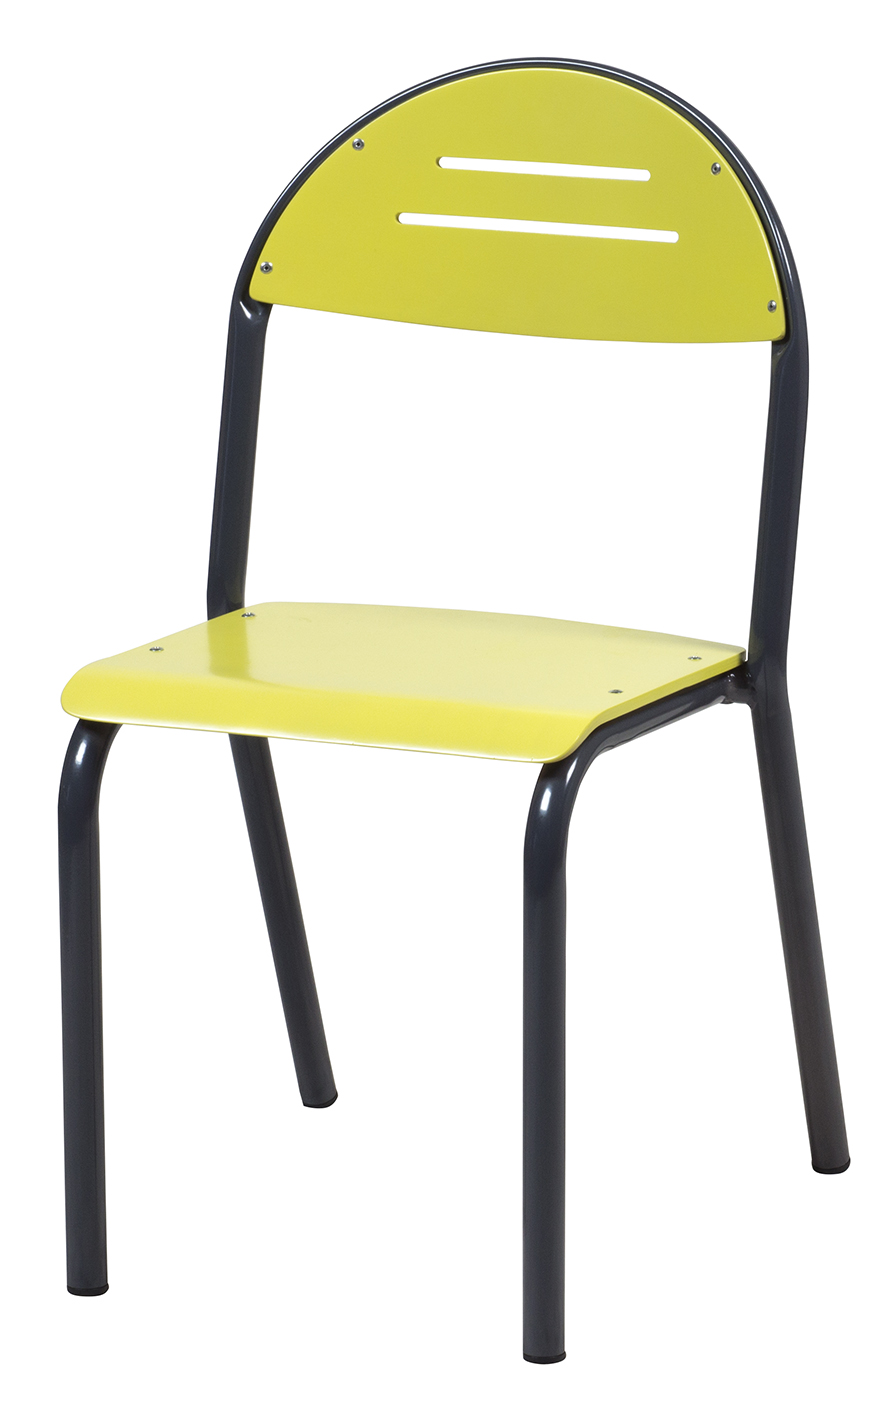 DPC - RESTAURATION Chaise TANAÏS 4 pieds